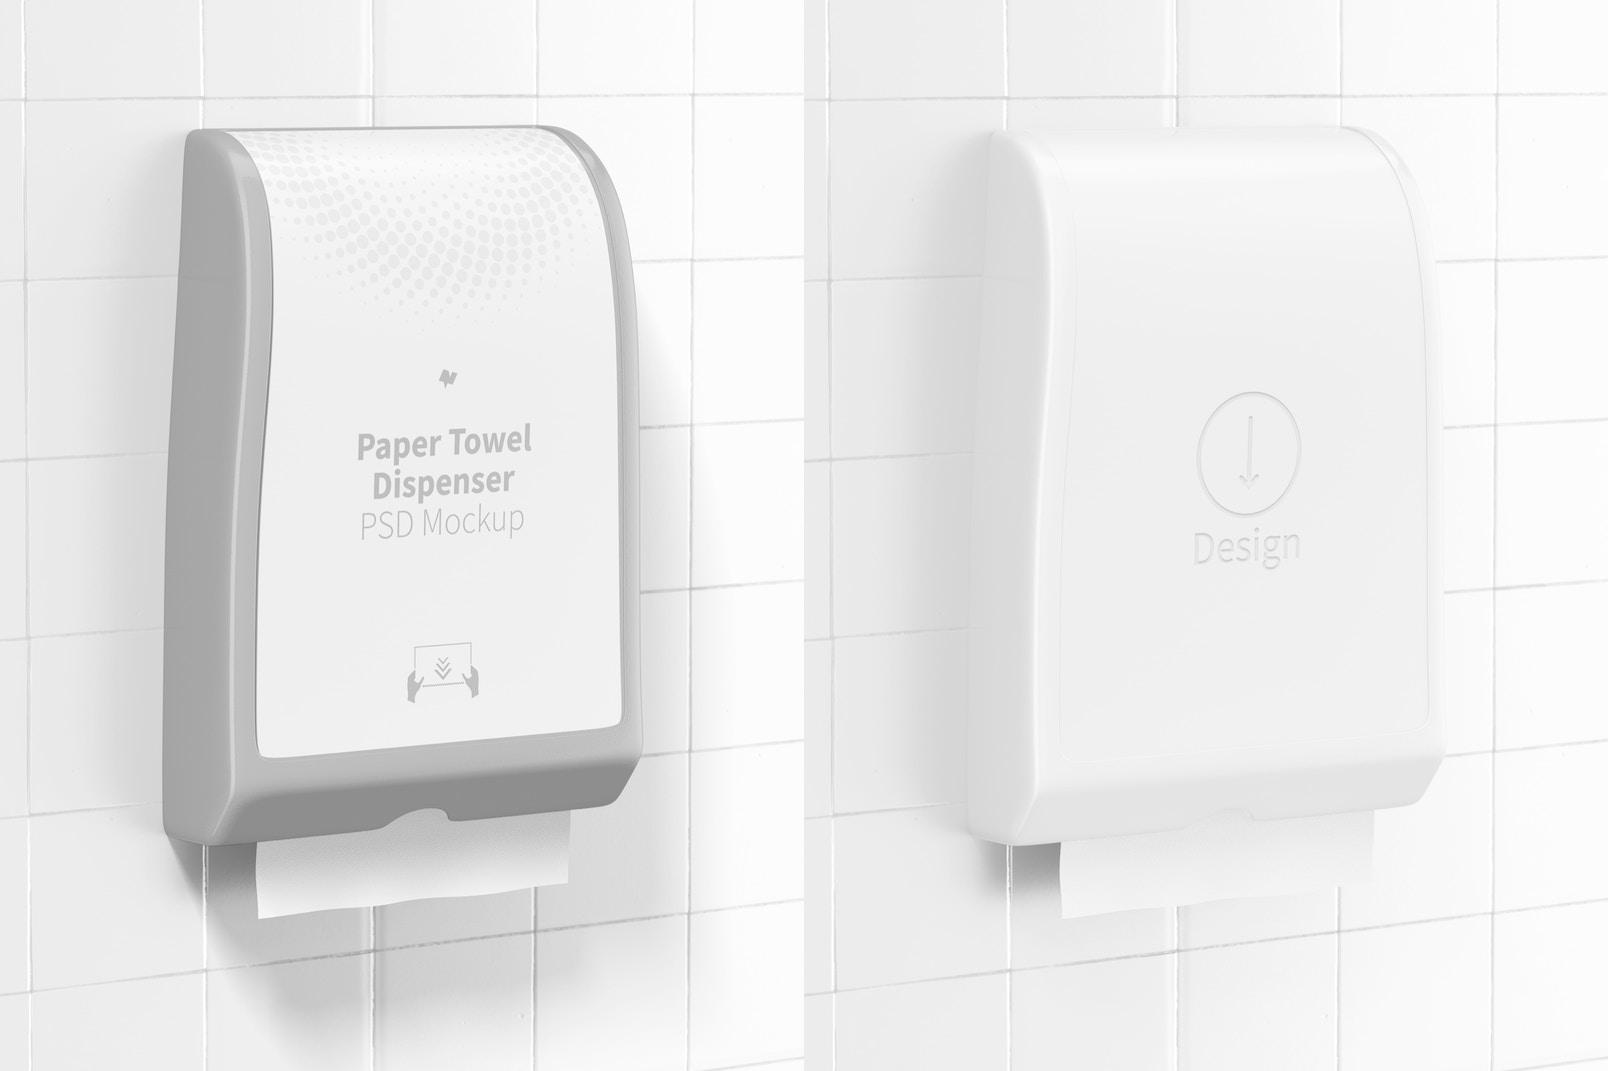 Paper Towel Dispenser Mockup